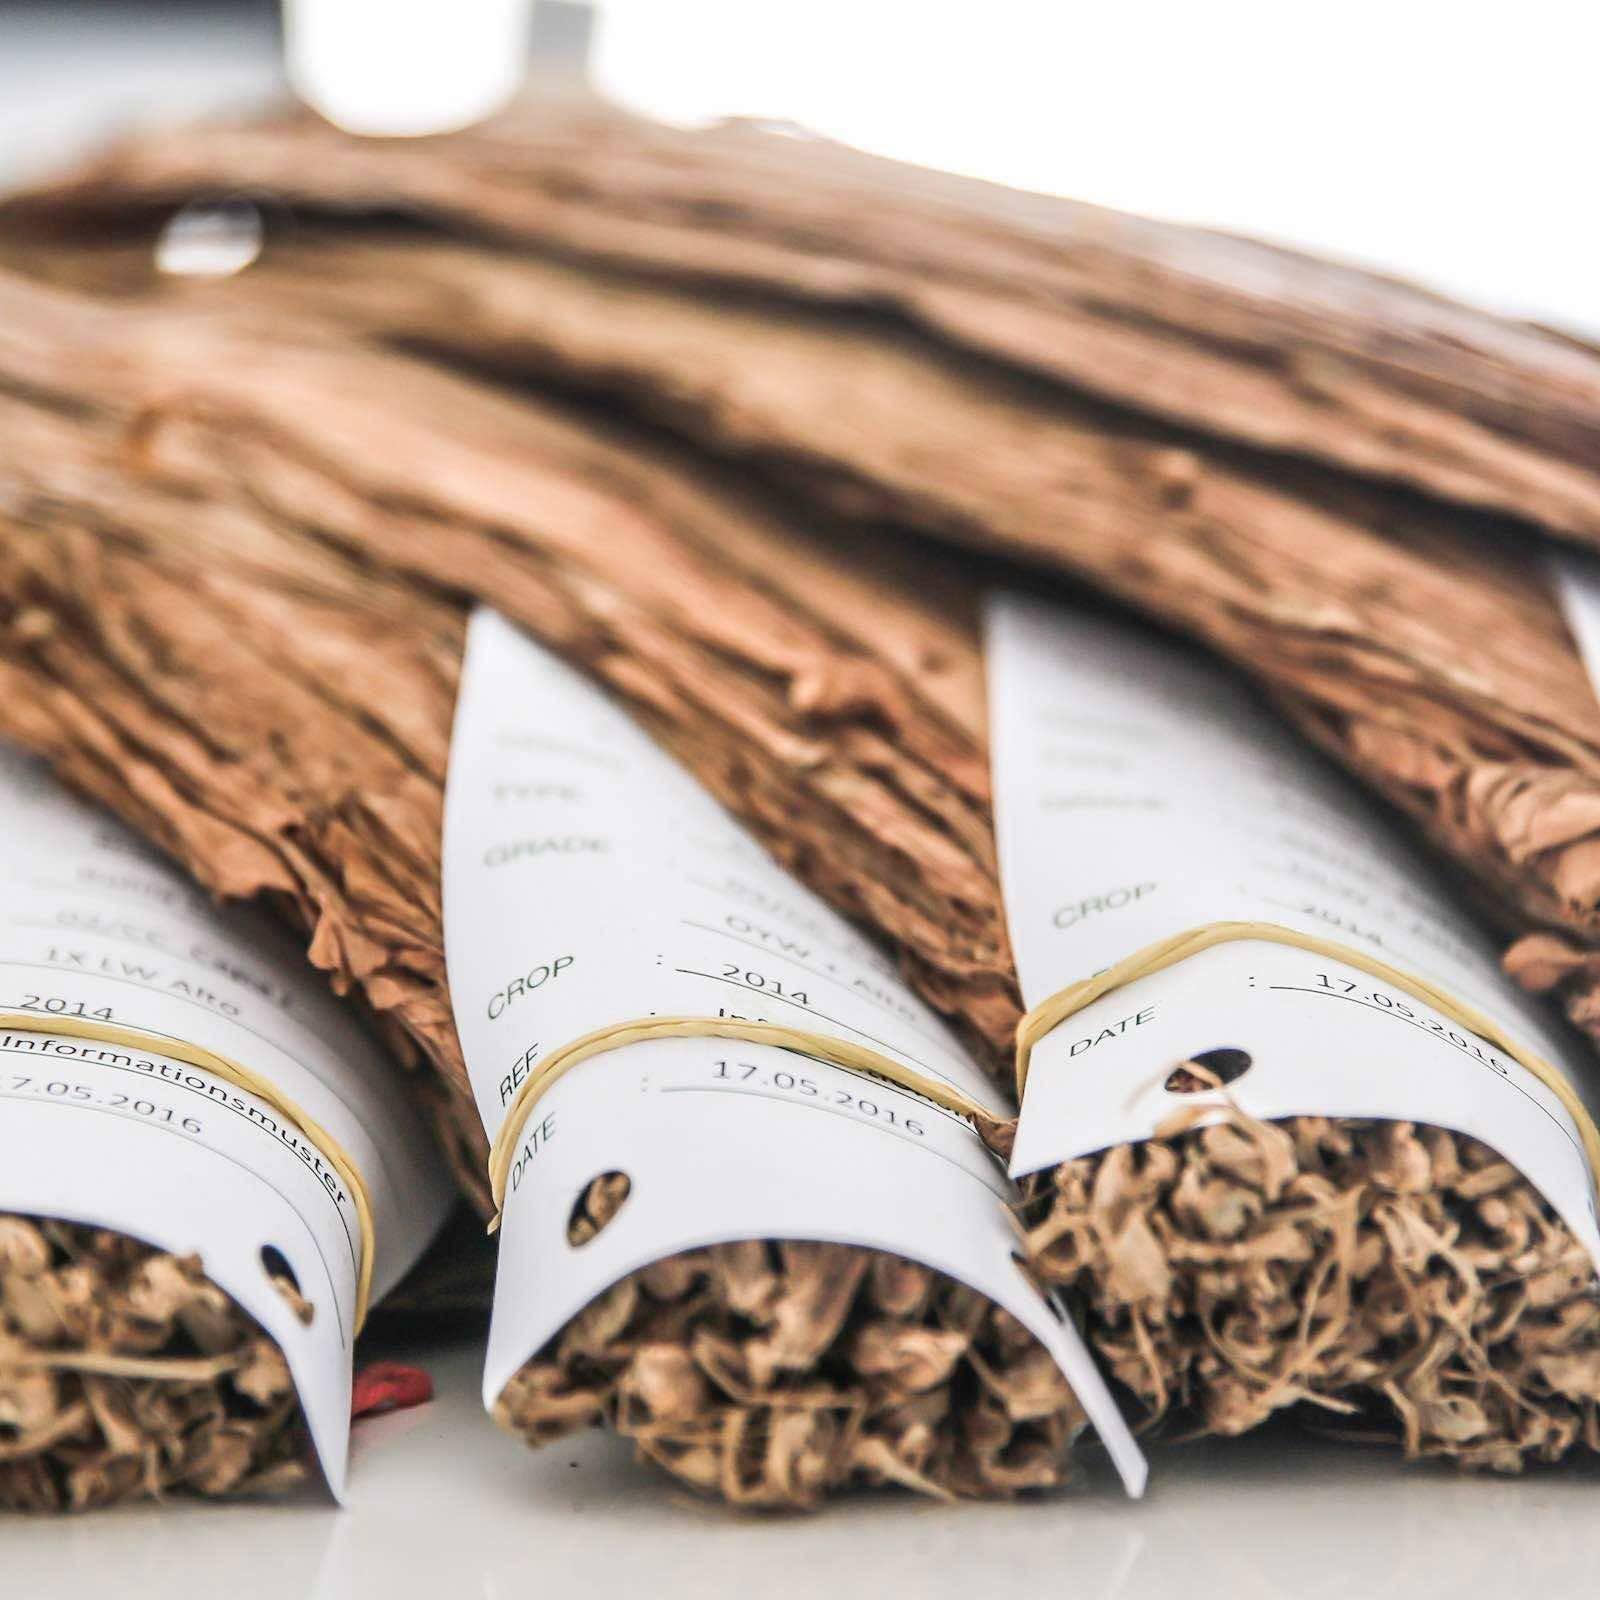 Zigarrendreher | Hamburg | Zigarrenroller | Trocadero | Zigarren | Drehen | Tabak | Banderole | Bauchbinde | Tabak | Sumatra | Brasilien | Indonesion | Cuba | Torpedo | Robusto | Churchill | Corona